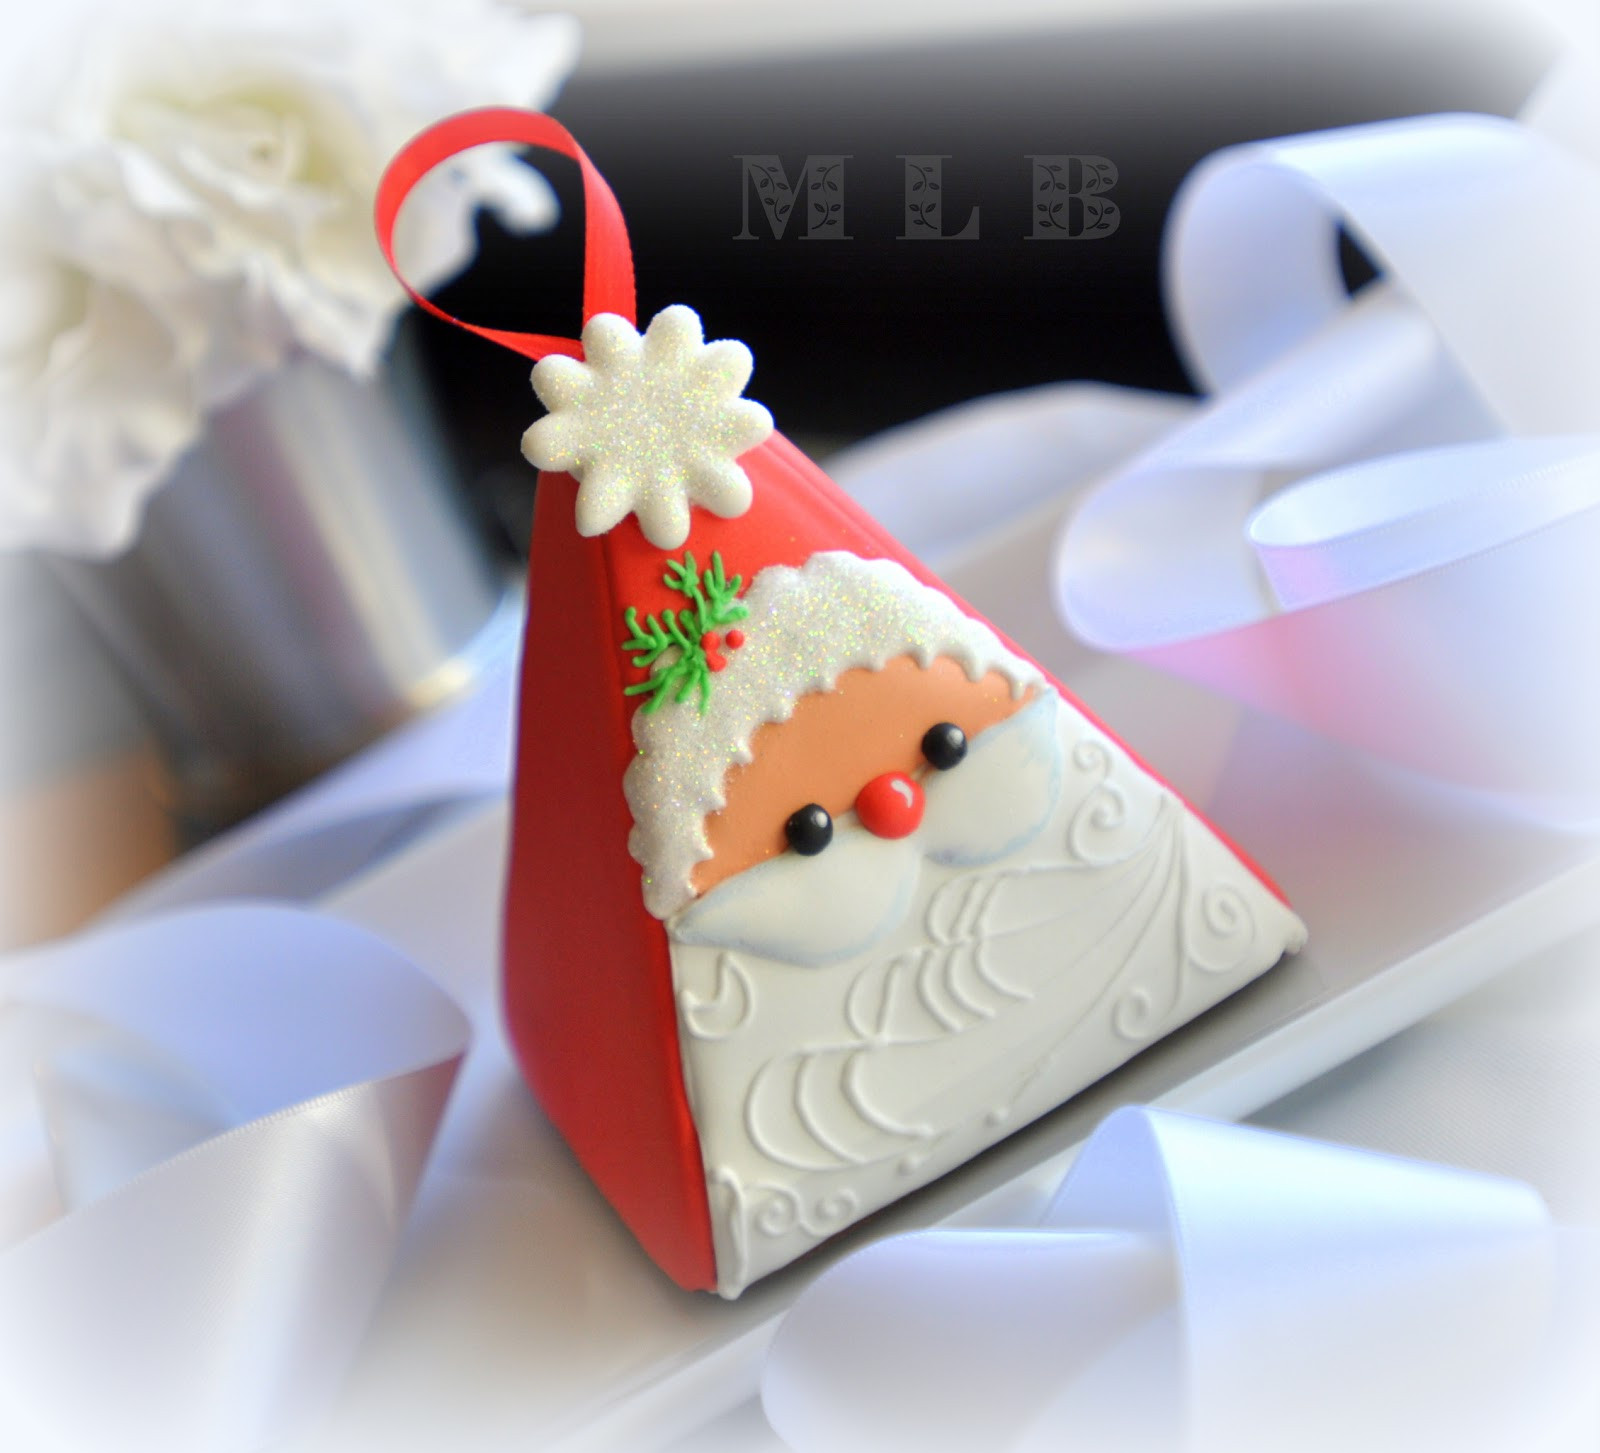 Bakery Christmas Cookies  My little bakery 🌹 Christmas cookie